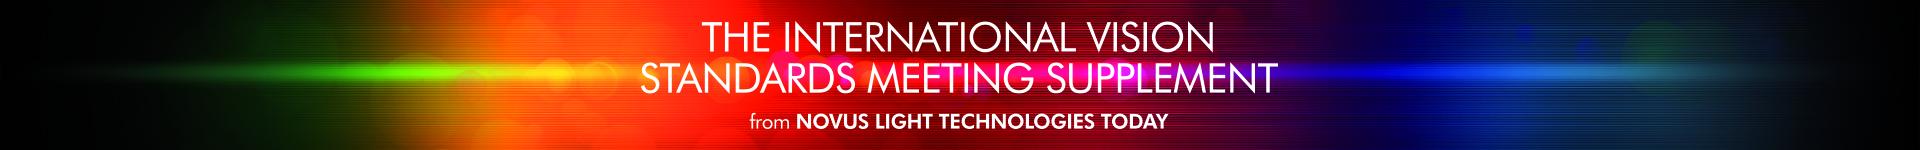 International Vision Standards Meeting Supplement 2015